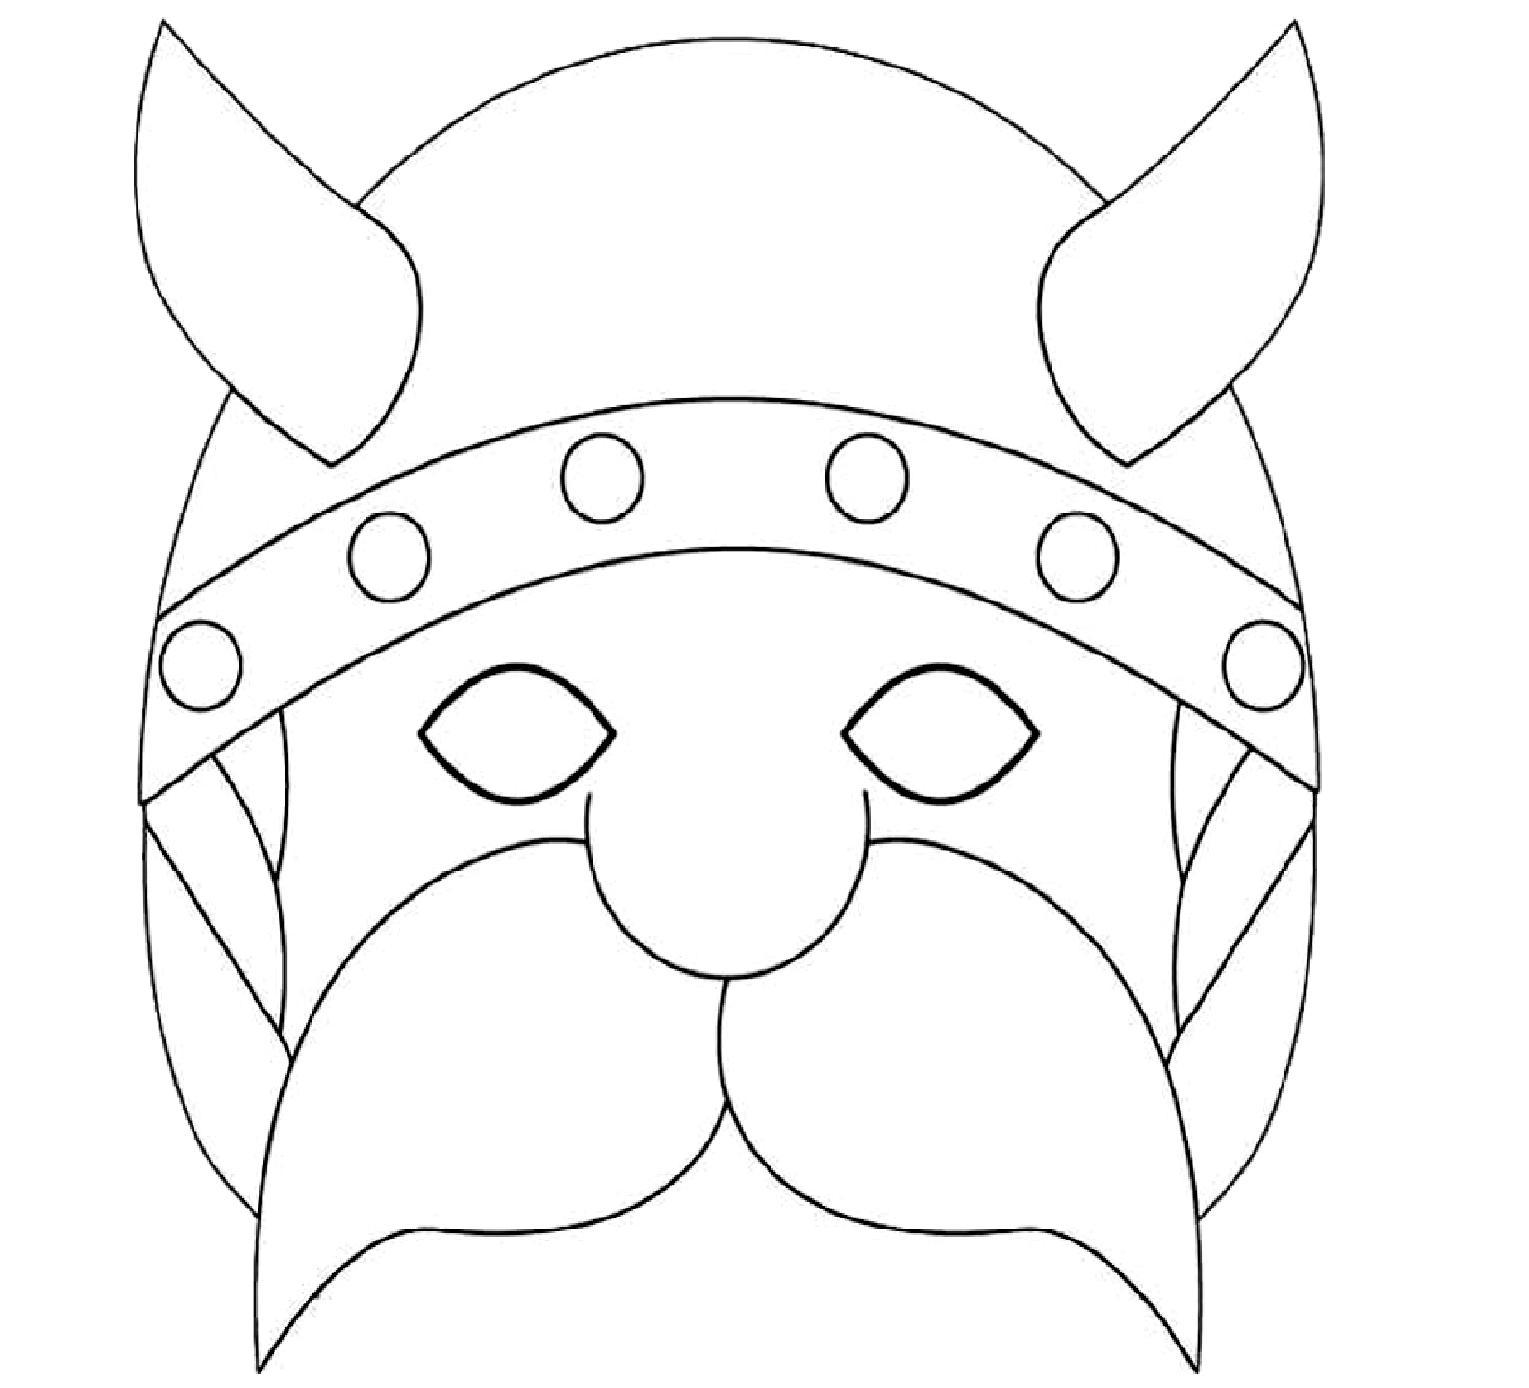 Coloriage masque gaulois imprimer - Coloriage masque ...